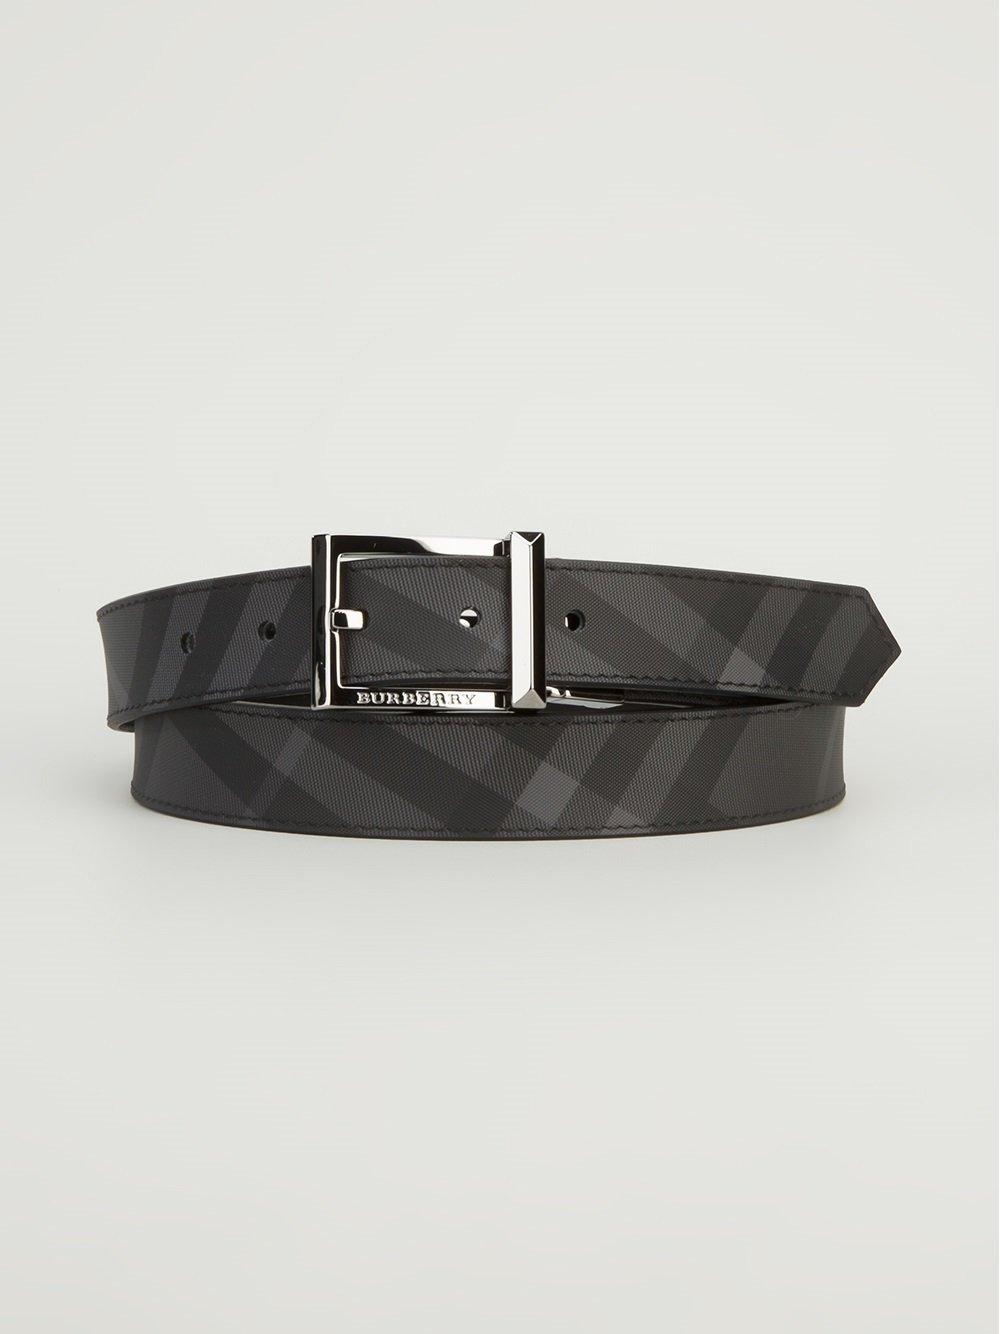 fa7750ecb10 Burberry House Check Print Belt in Black for Men - Lyst